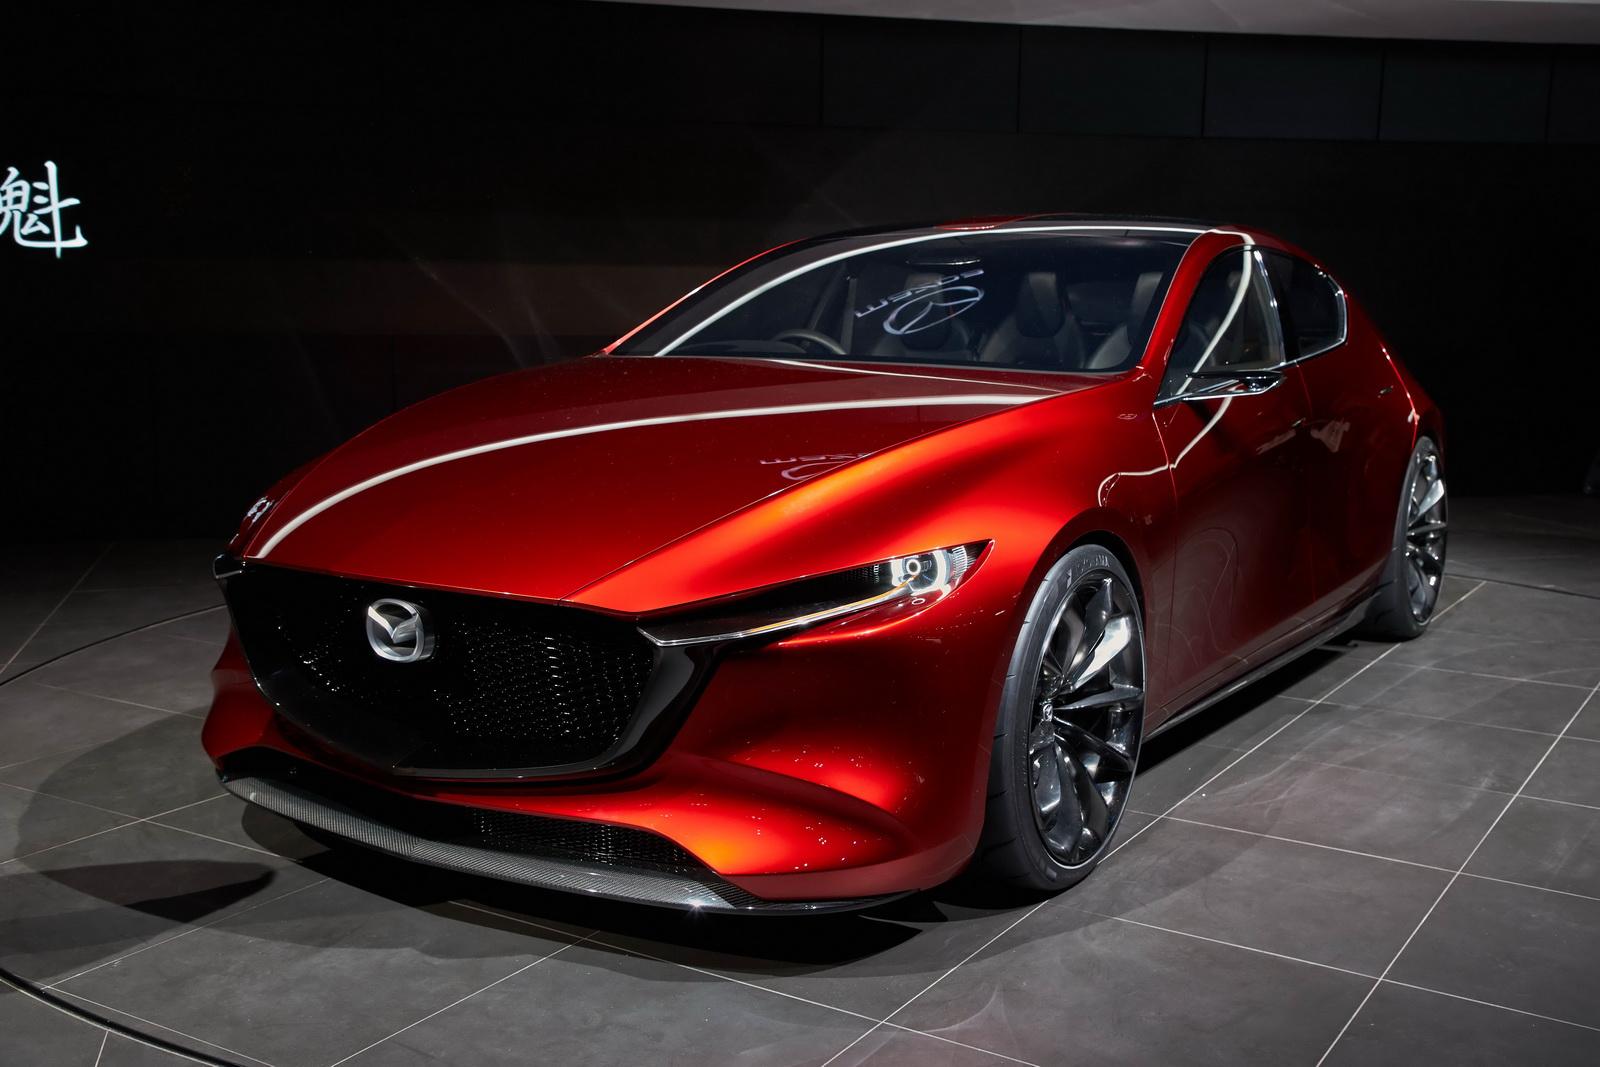 Mazda S Sexy Kai Concept Steals The Show 50 Pics Carscoops